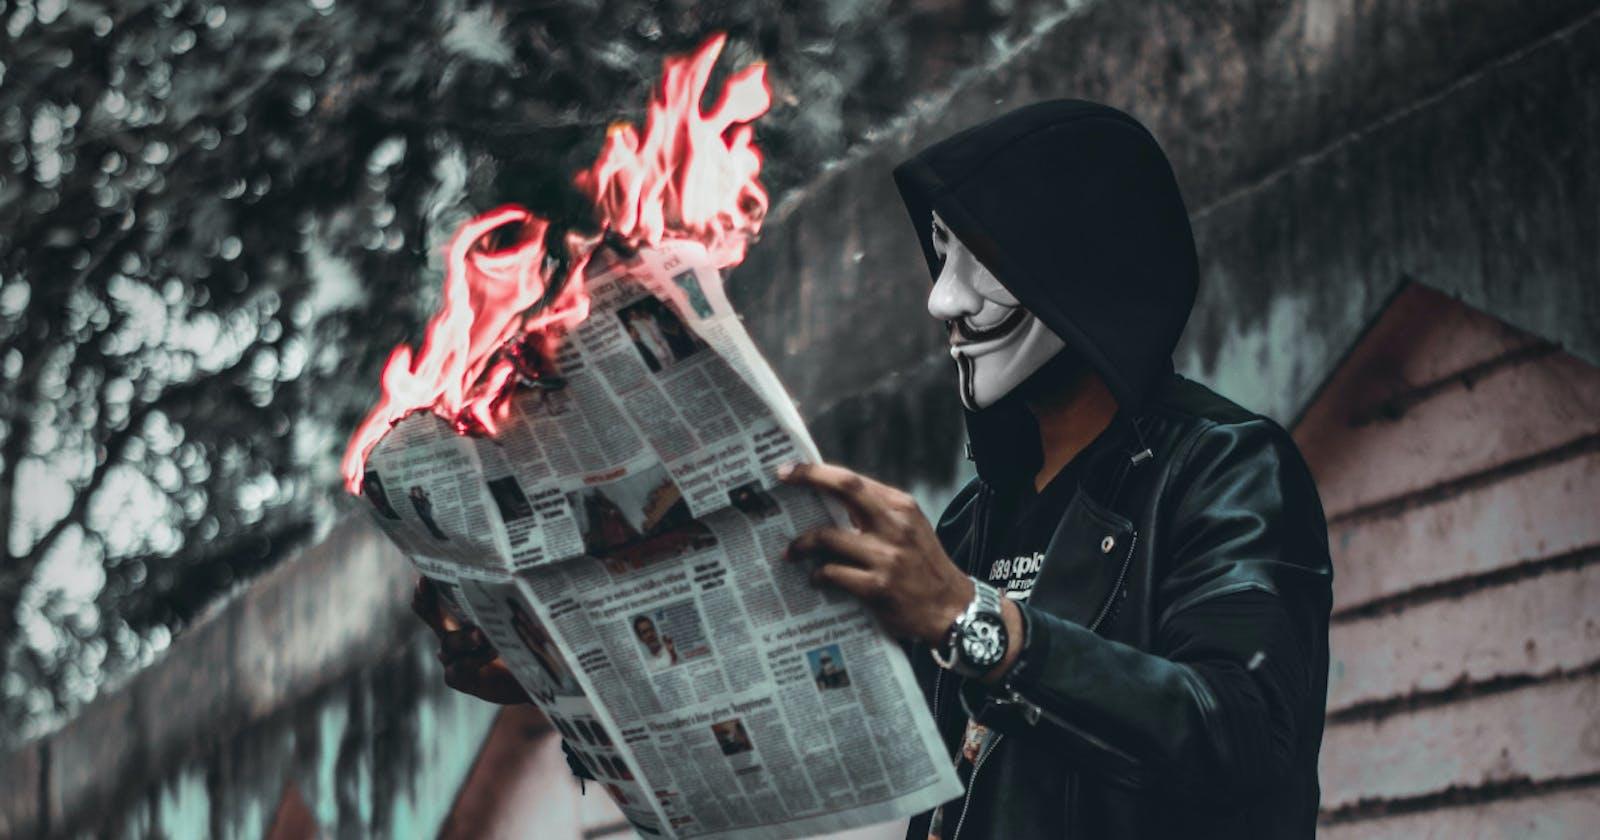 How One Guy Ruined #Hacktoberfest2020 #Drama